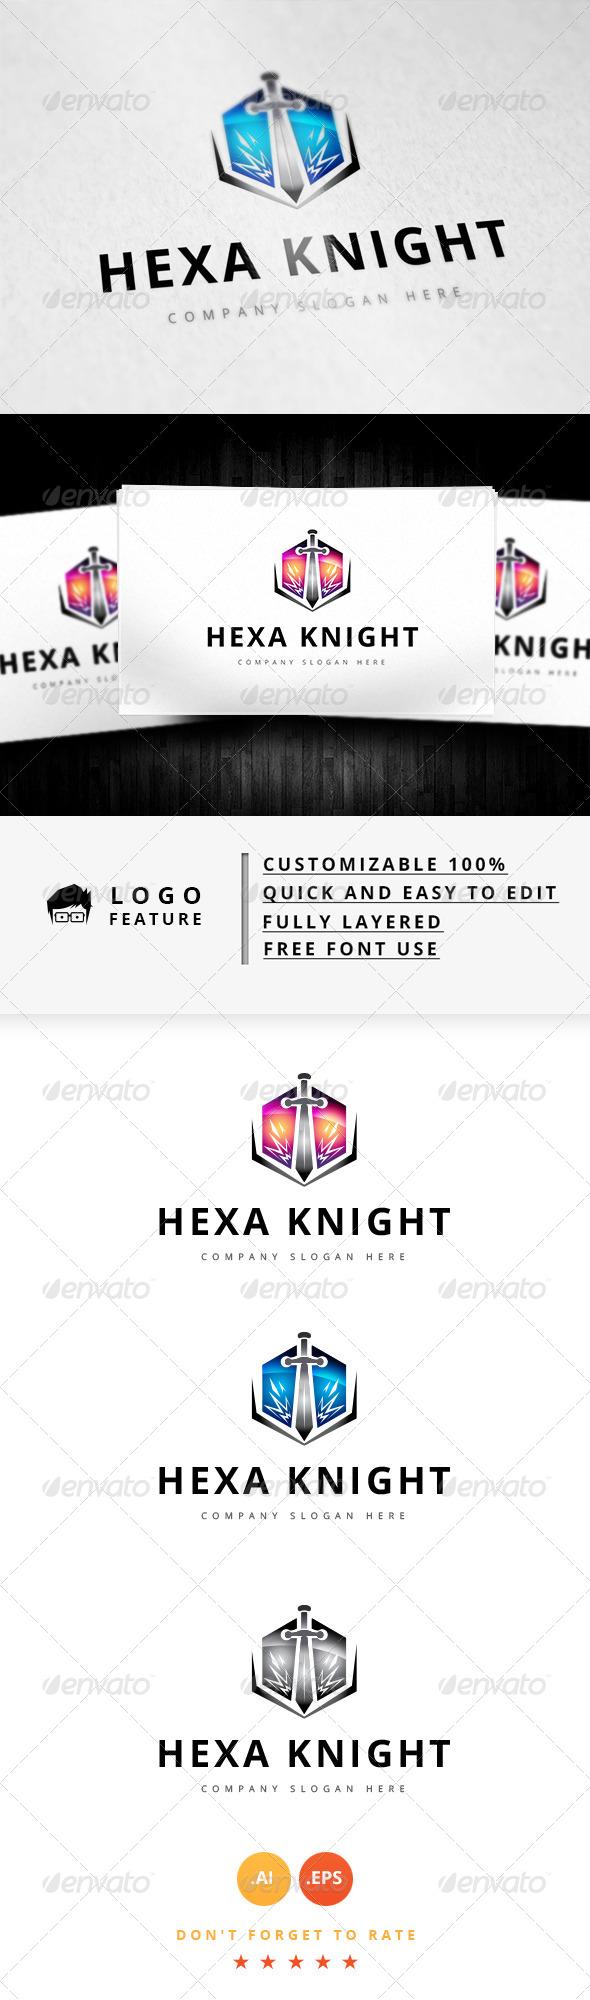 GraphicRiver Hexa Knight Logo 8292696